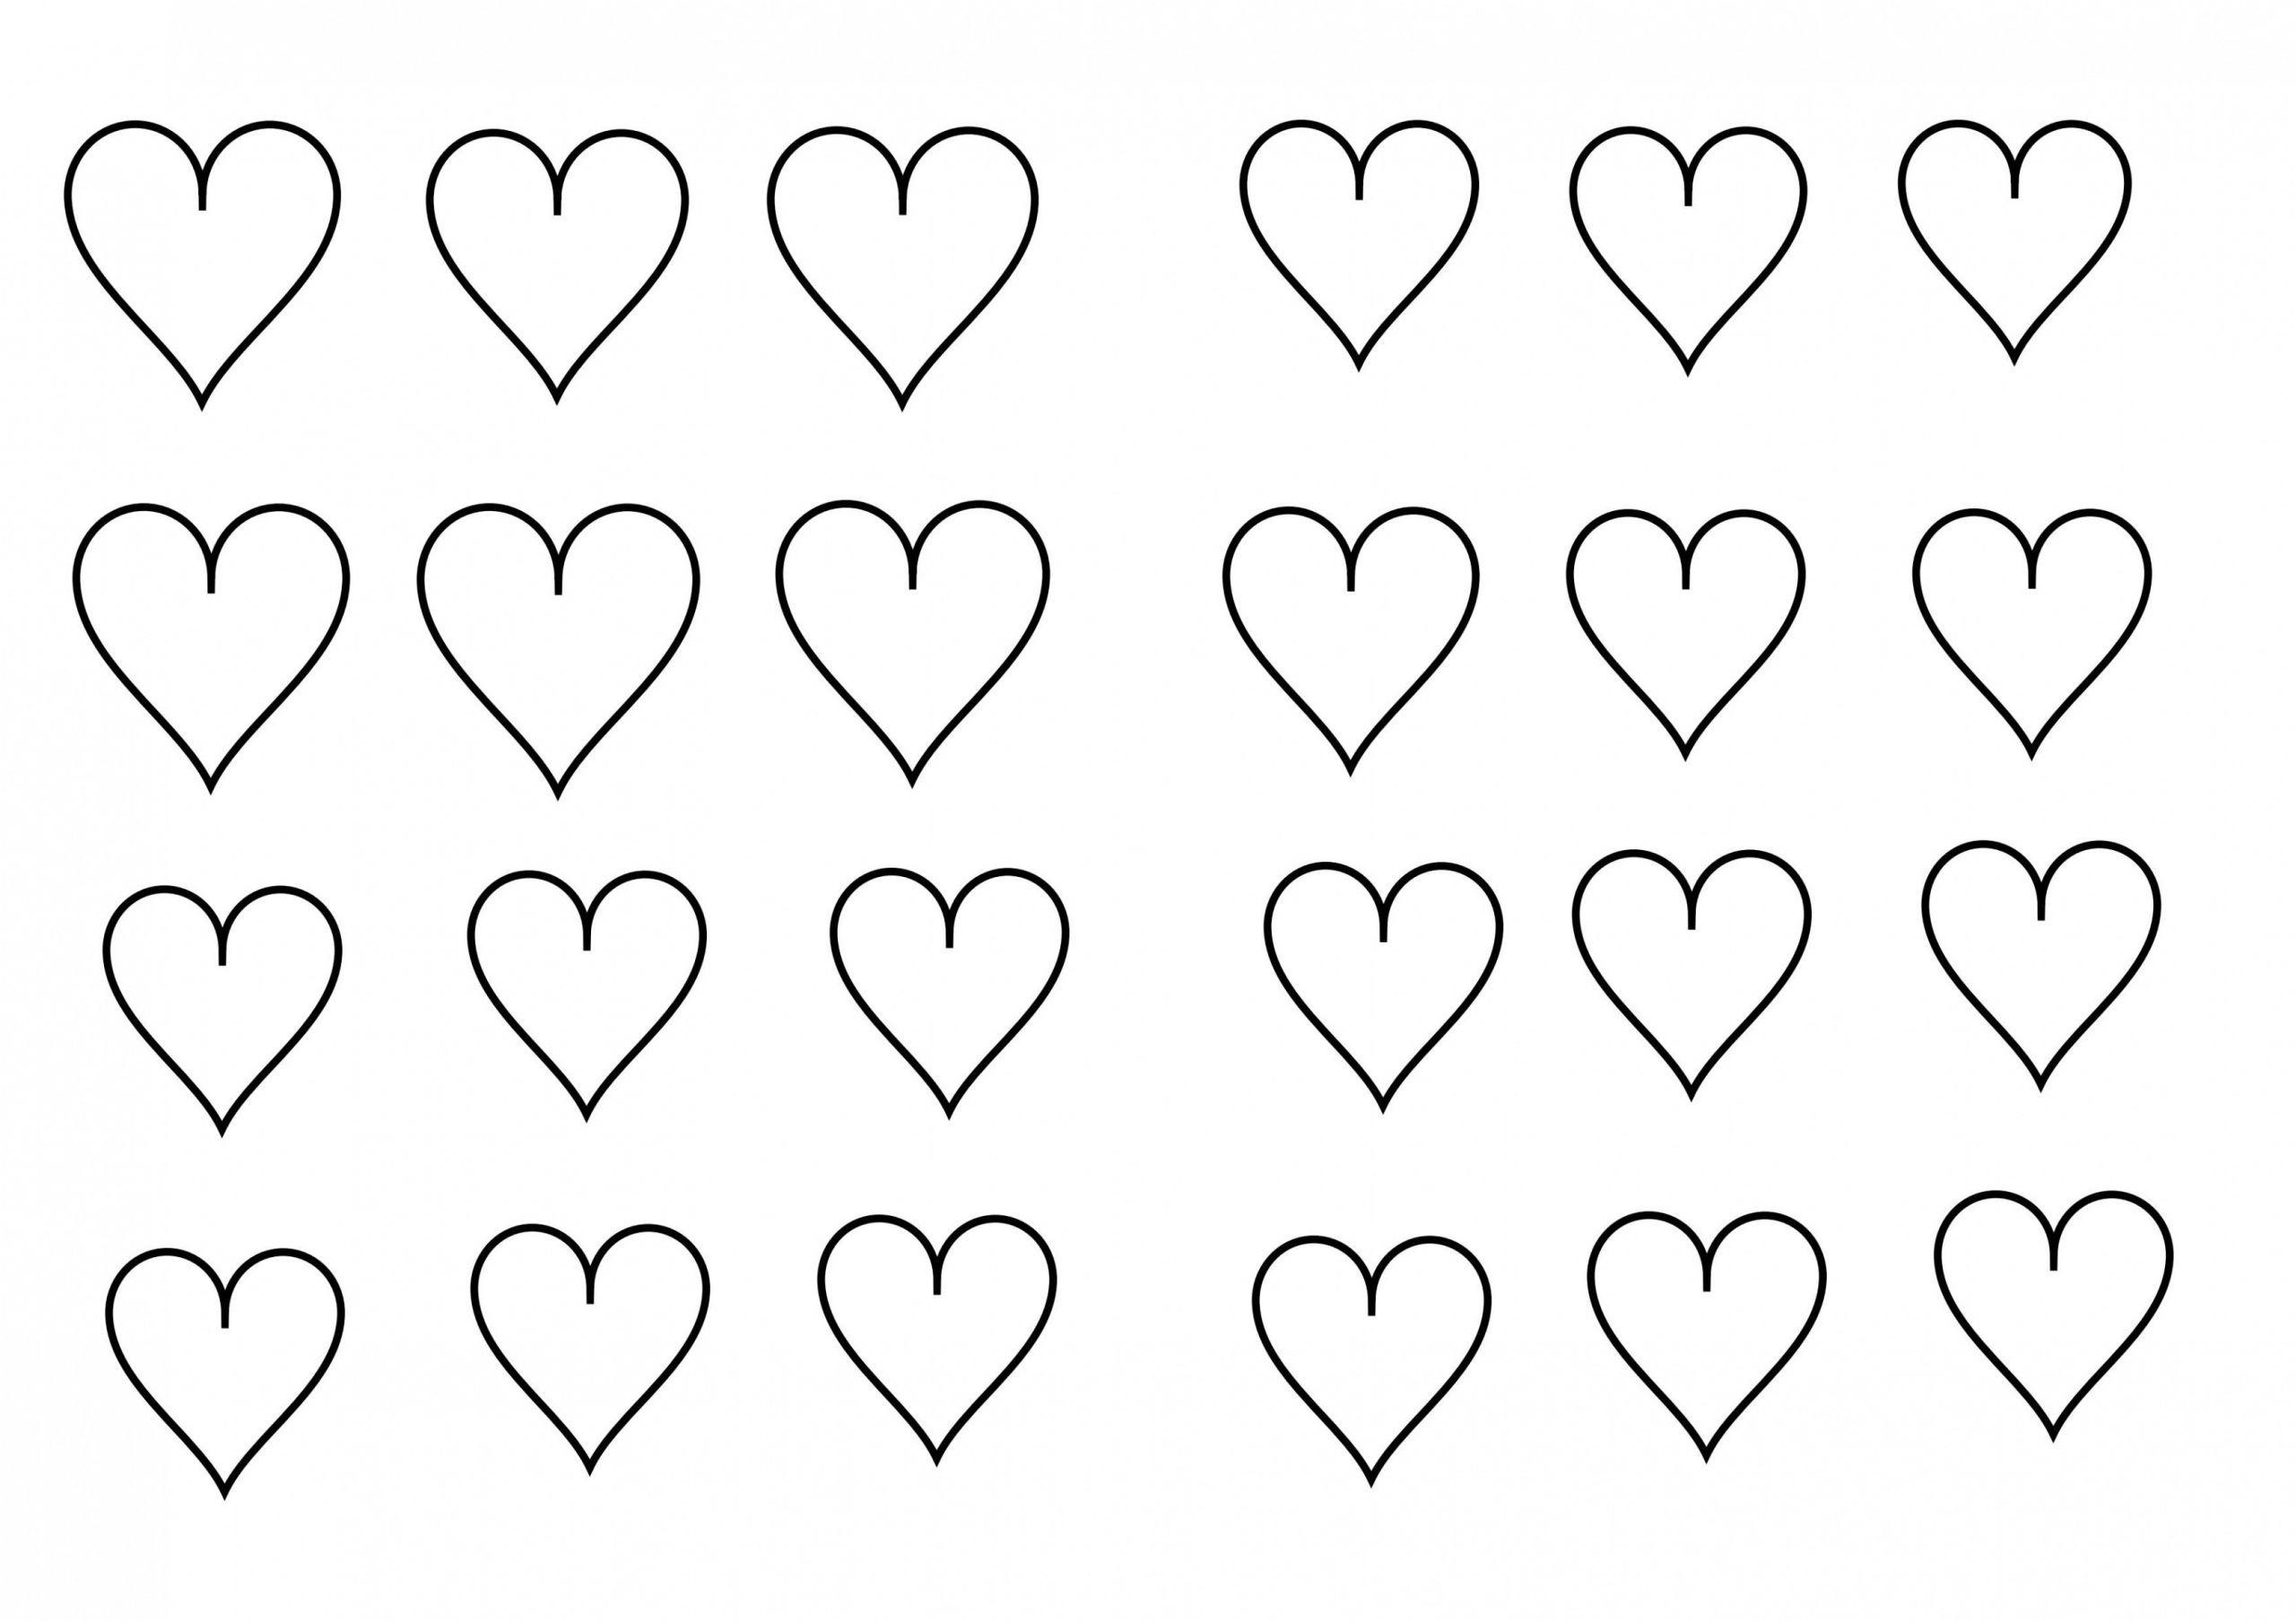 14 Simpliste Coeur Coloriage Images Coloriage Coeur Dessin De Coeur Coeur A Colorier